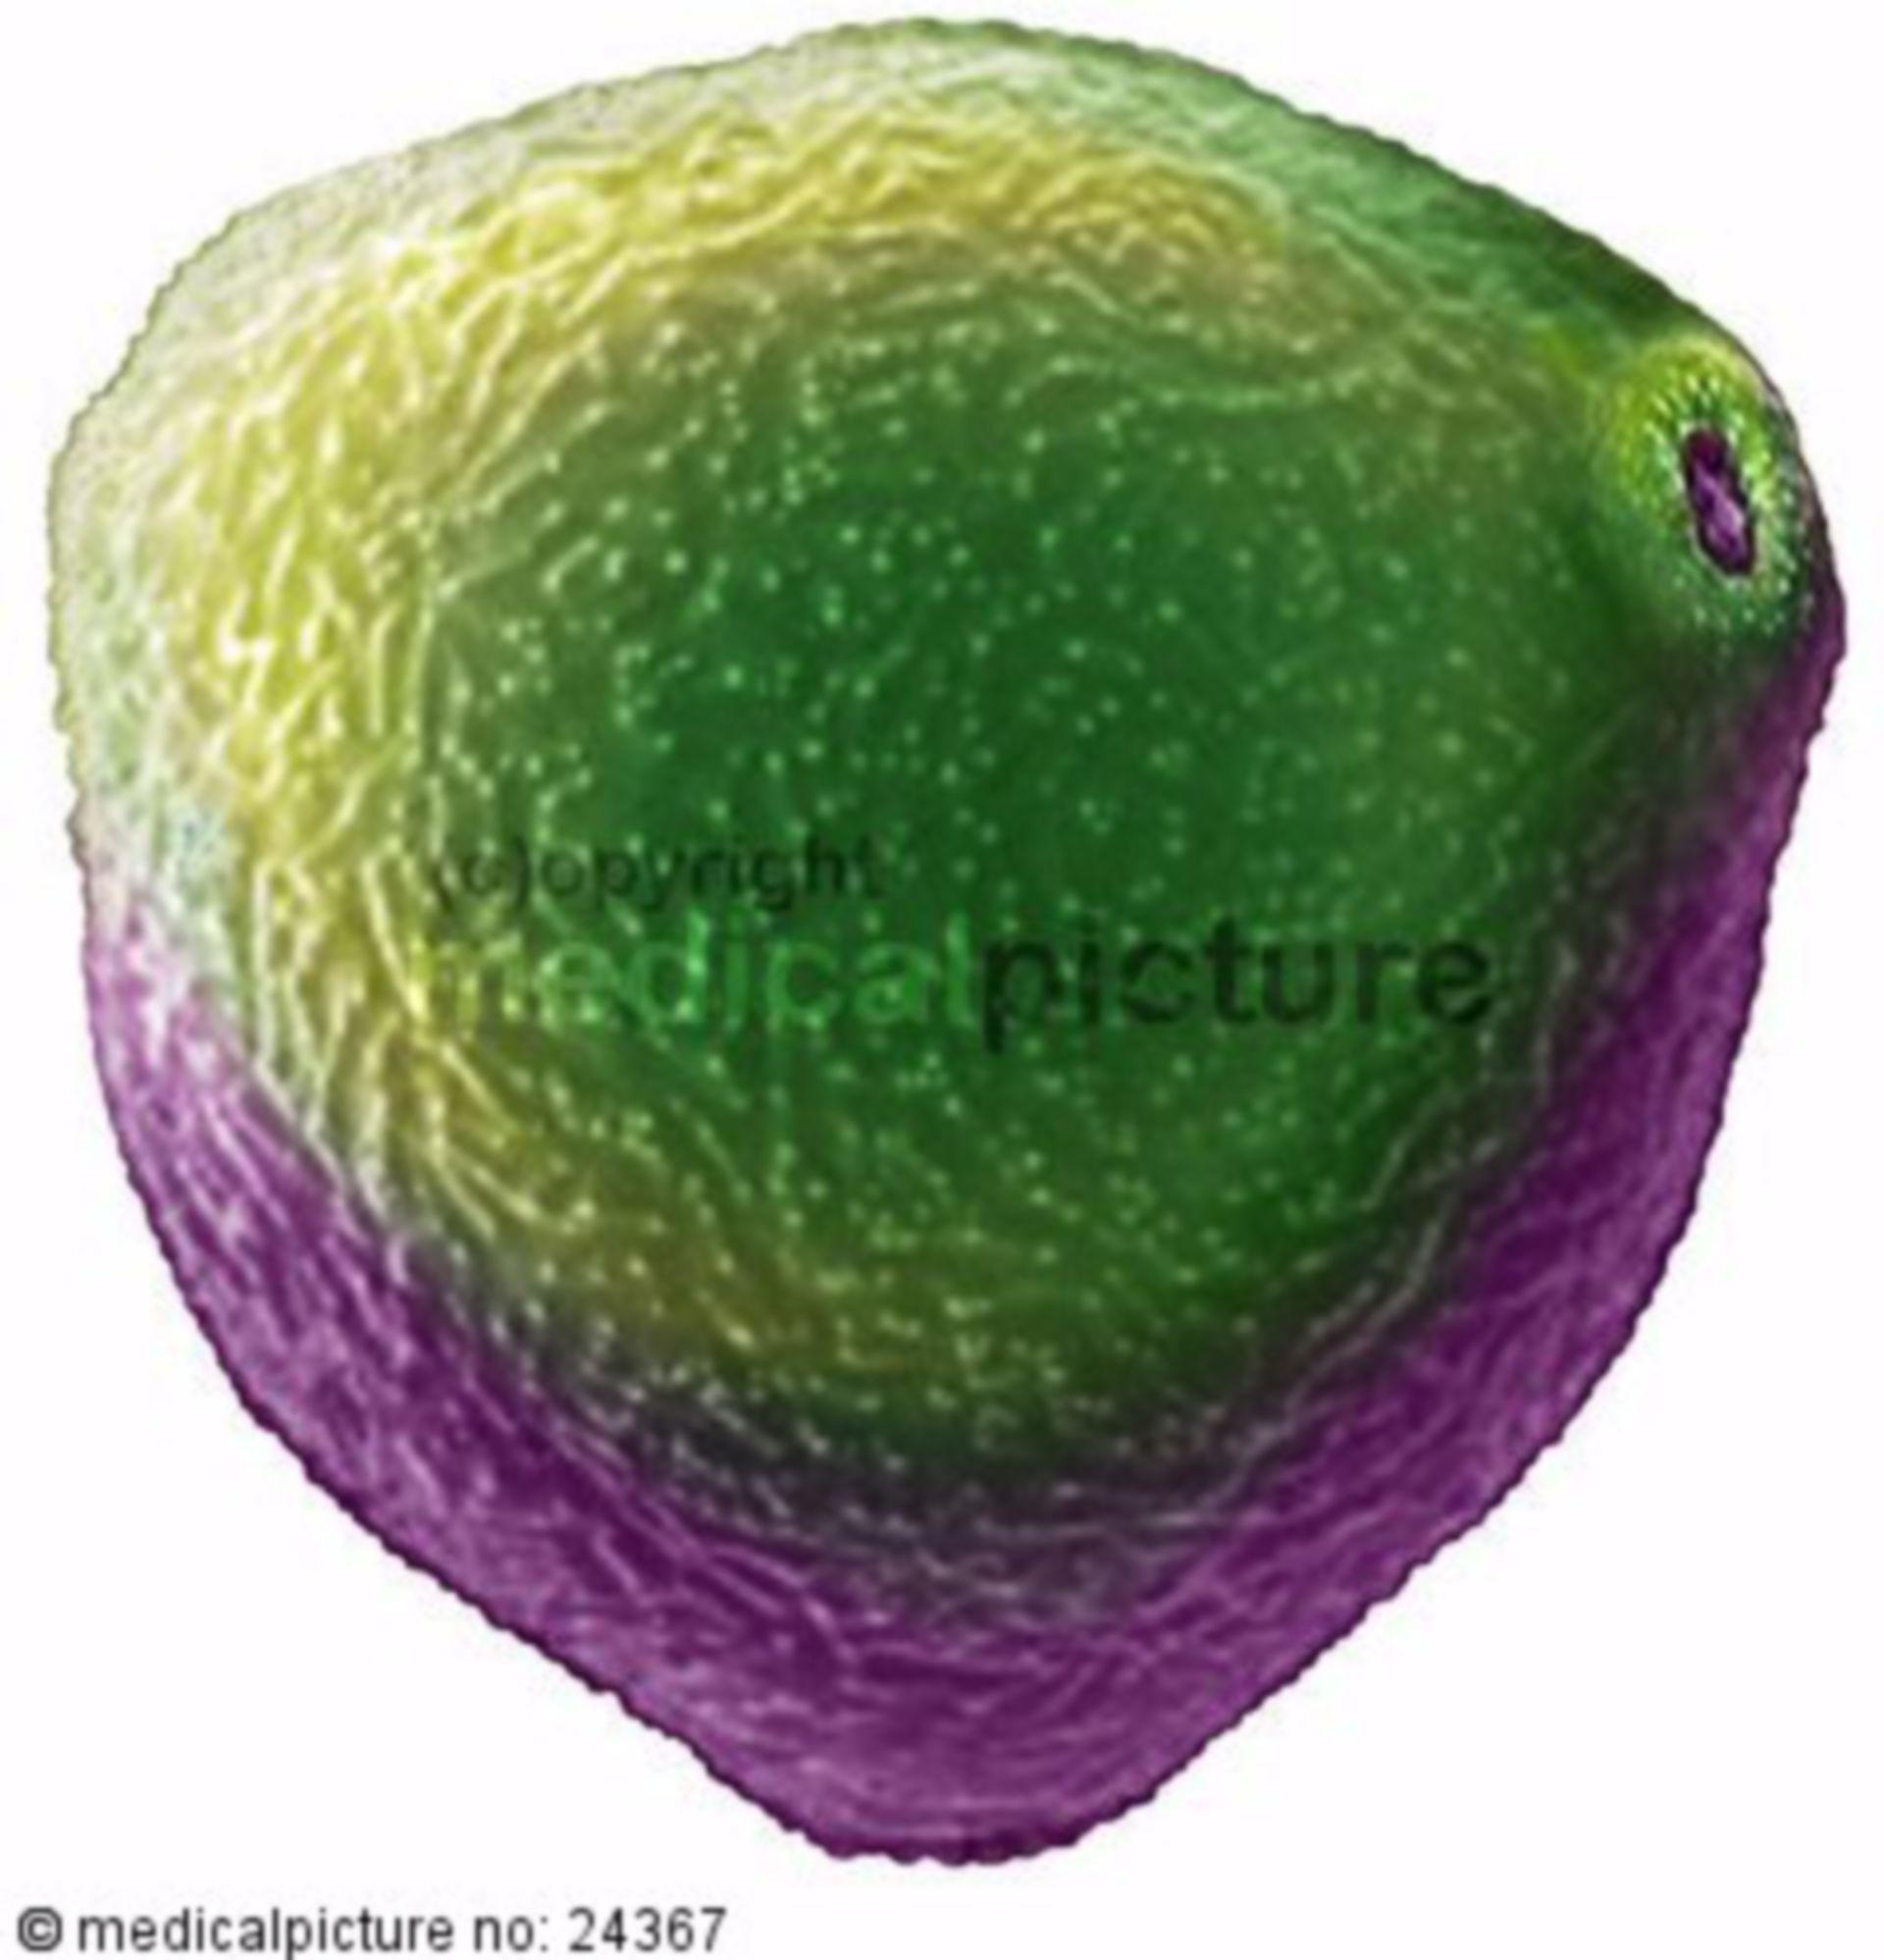 Hasel Polle, pollen of hazel